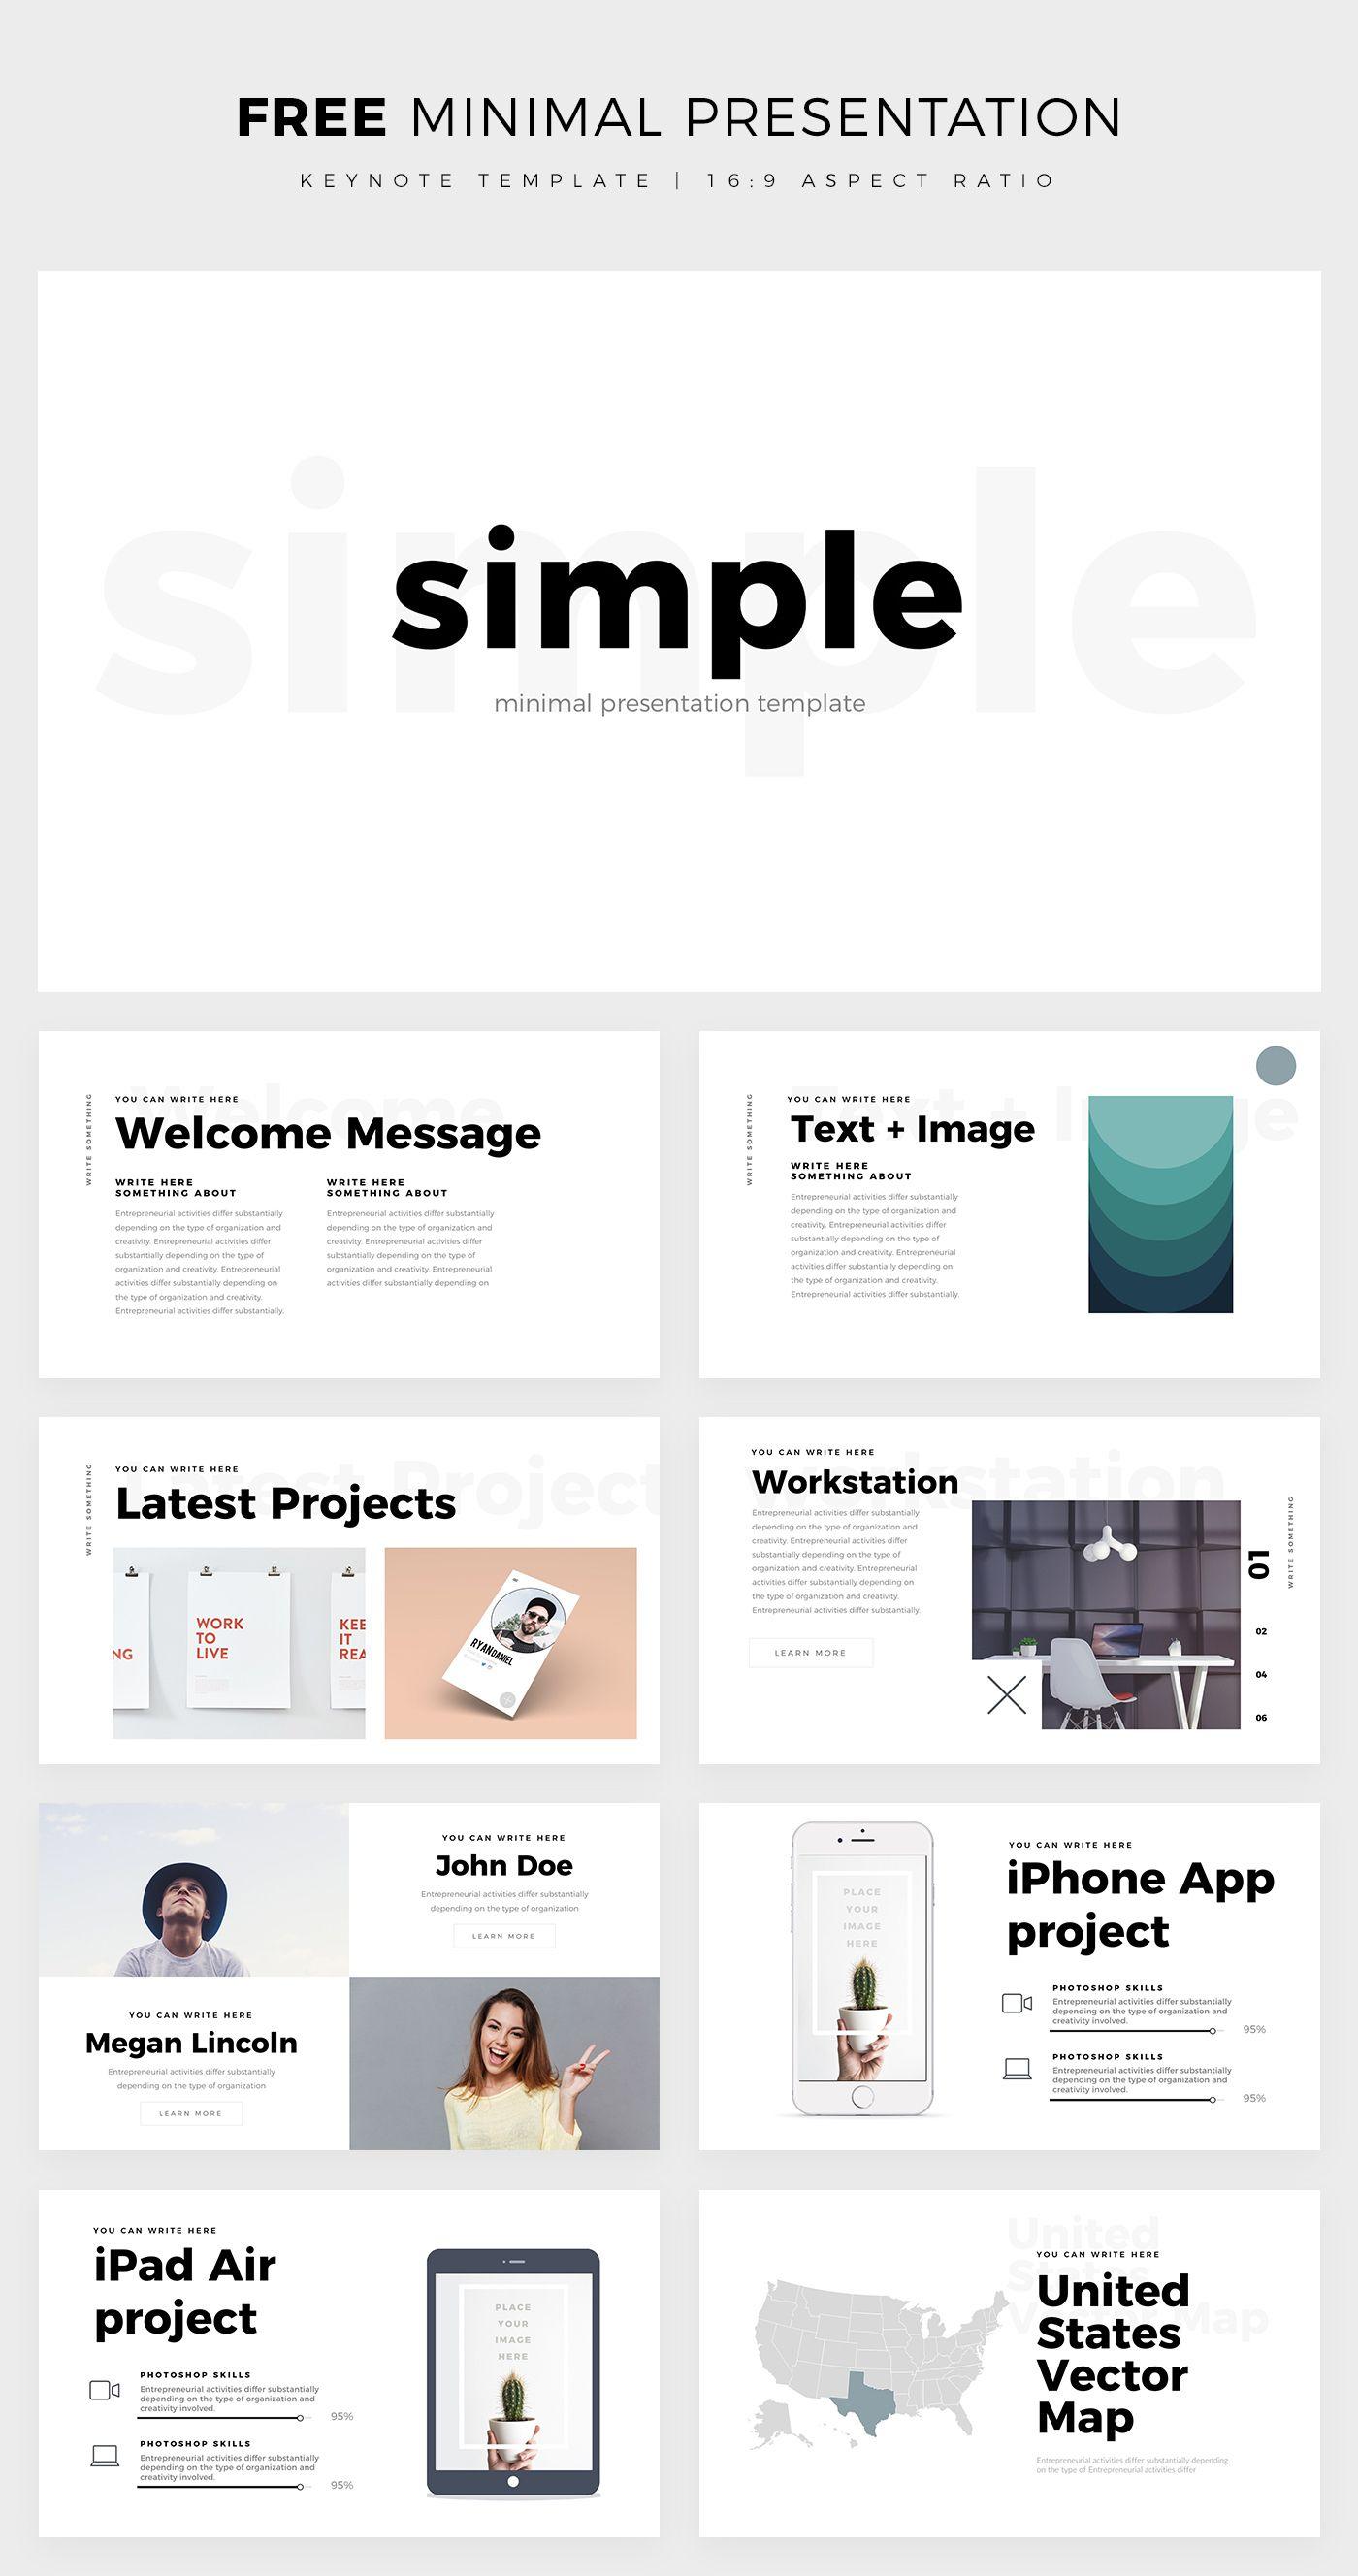 FREE SIMPLE MINIMAL KEYNOTE TEMPLATE on Behance | 平面排版 | Pinterest